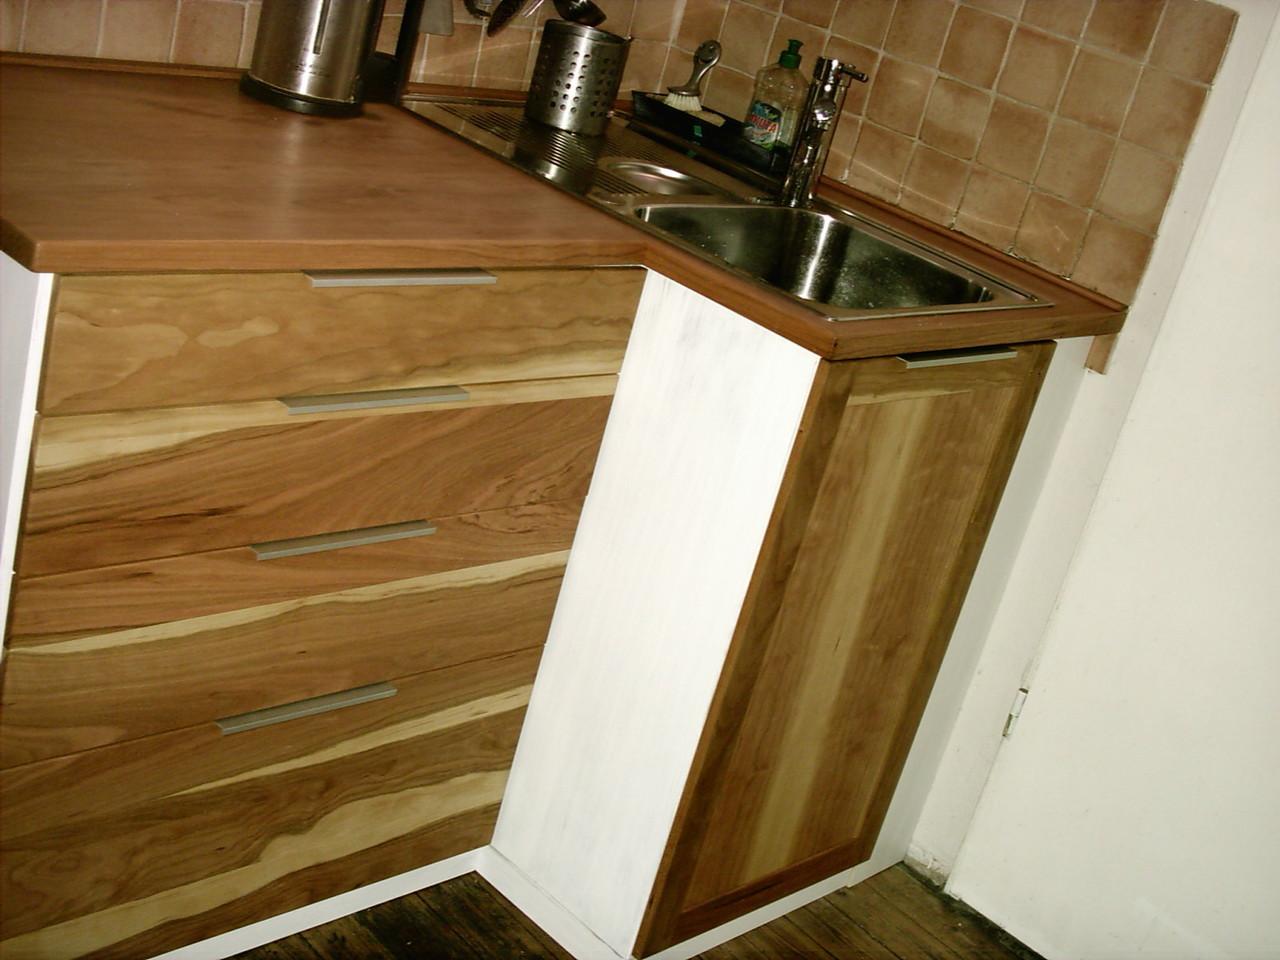 Küchenblock, Kirschholz und weiss lackiertes Birkenholz kombiniert